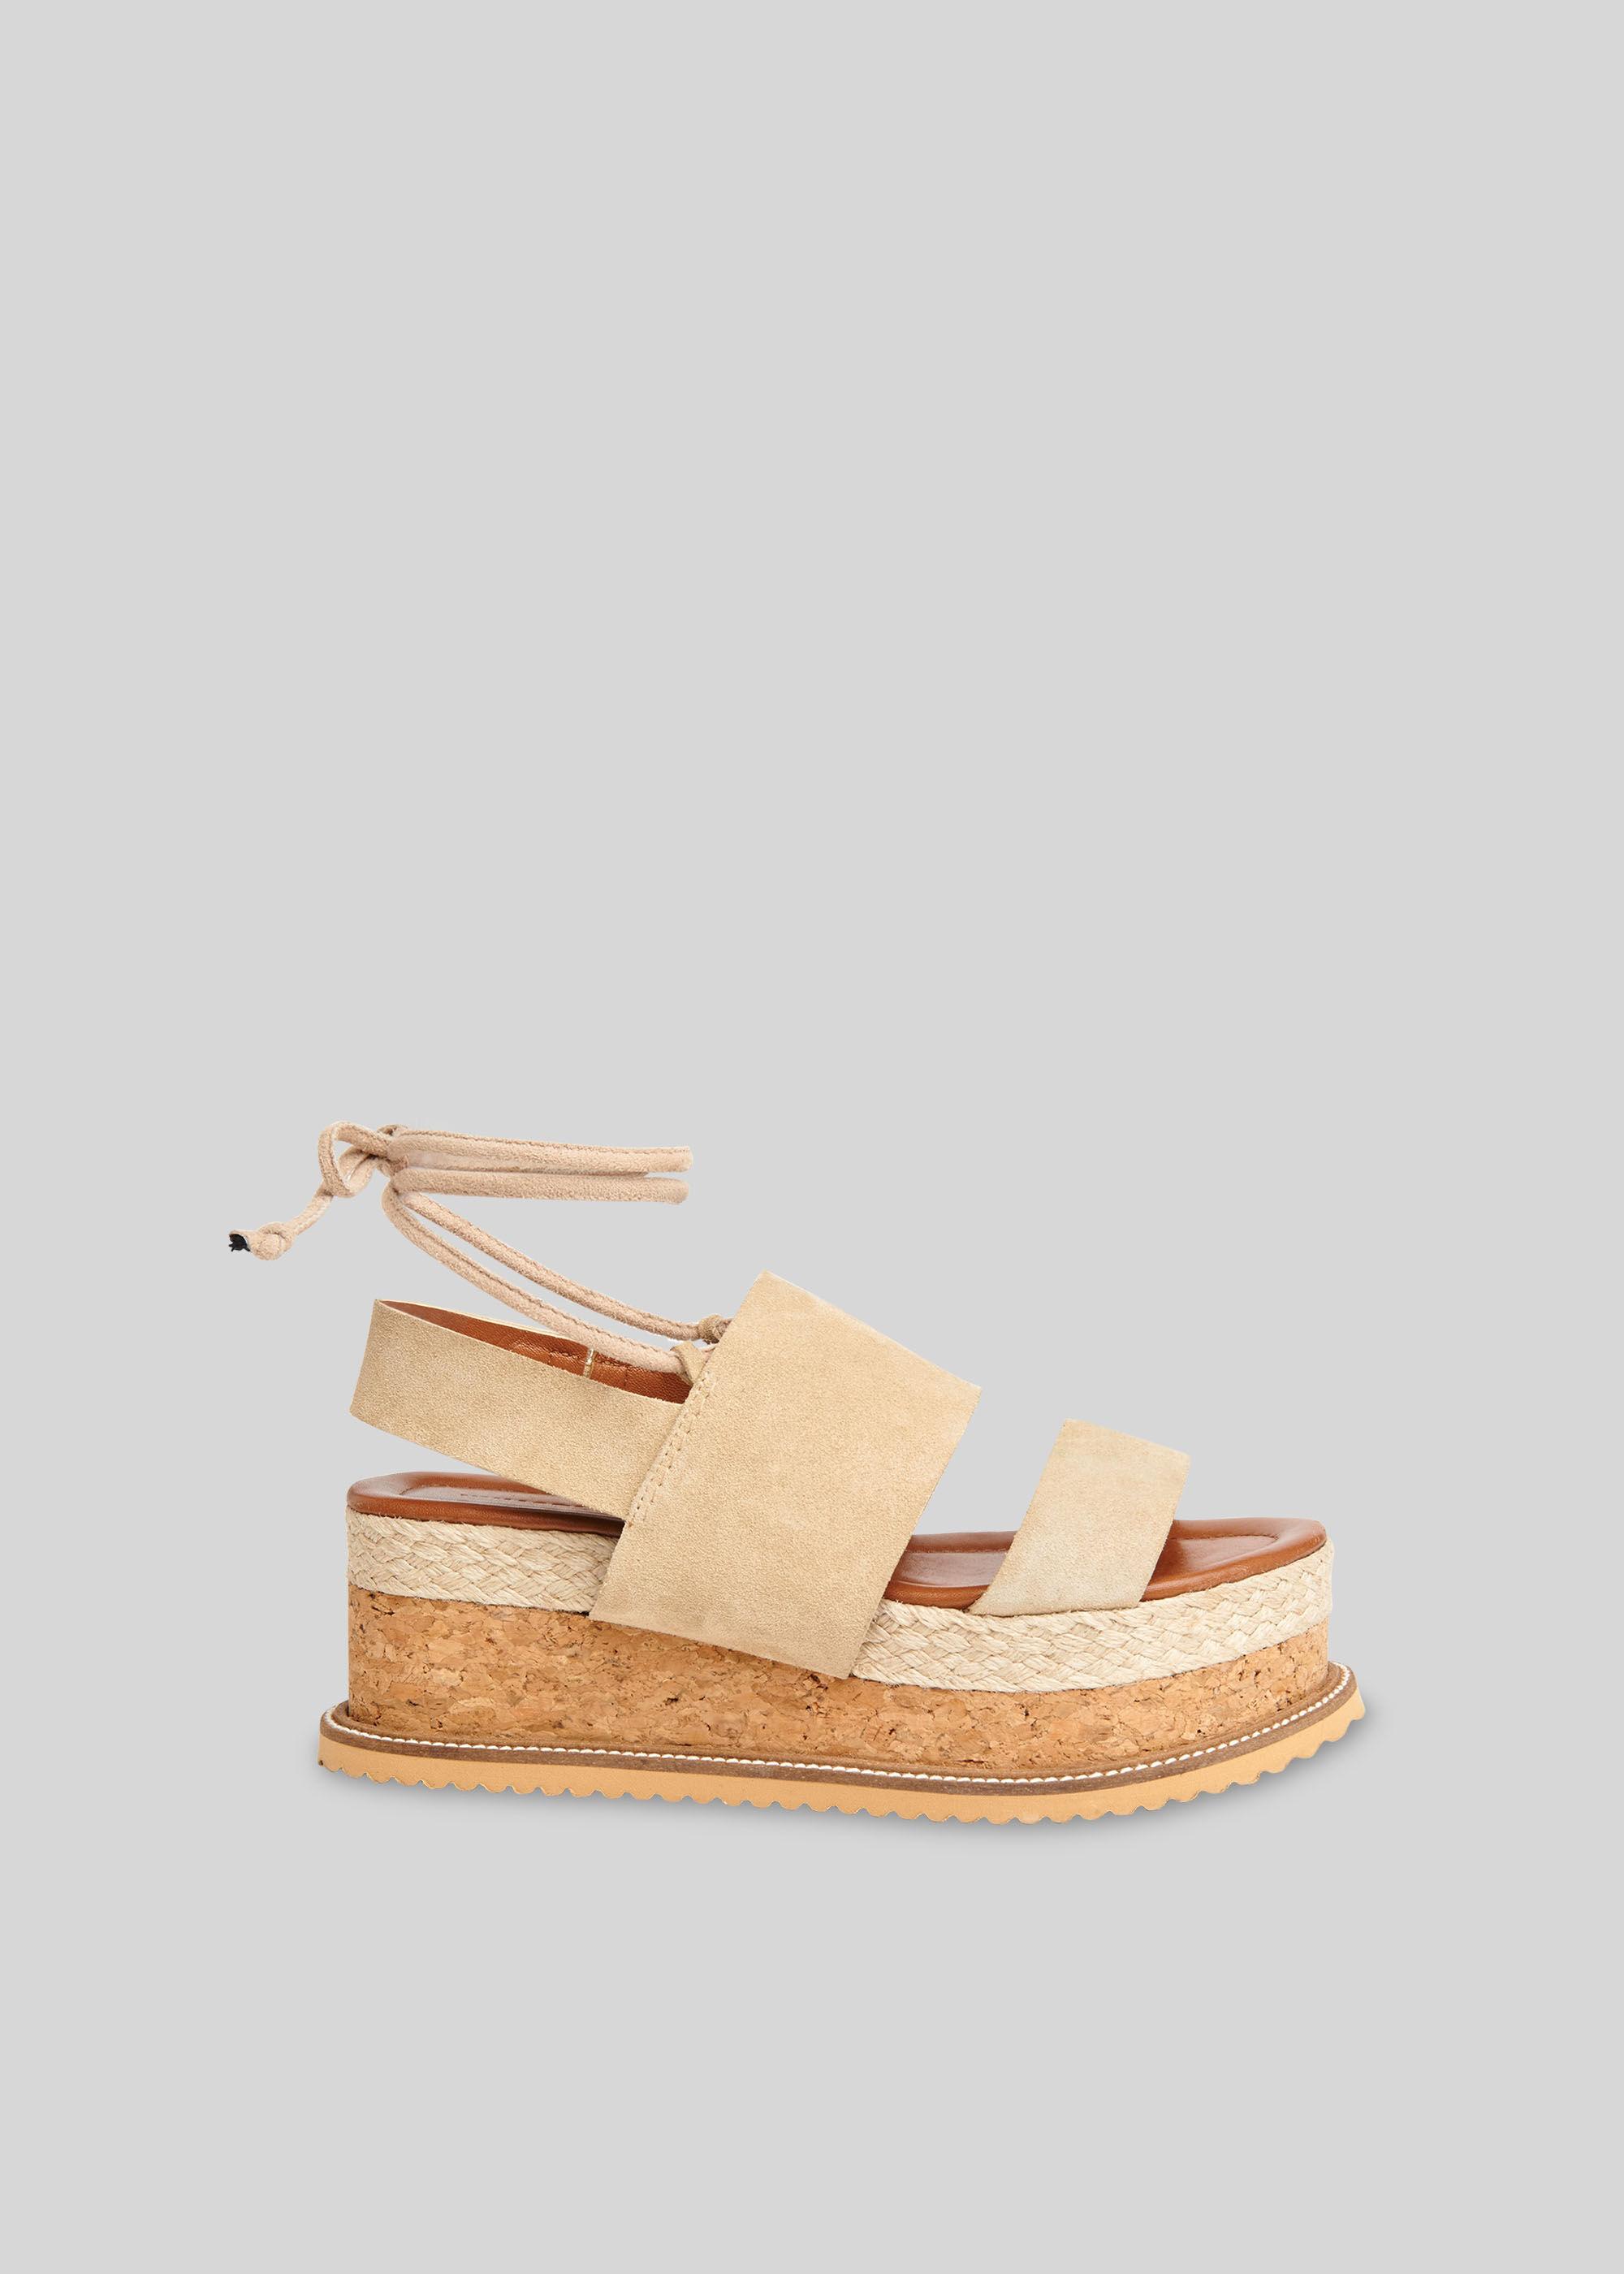 Stone Rae Flatform Sandal | WHISTLES